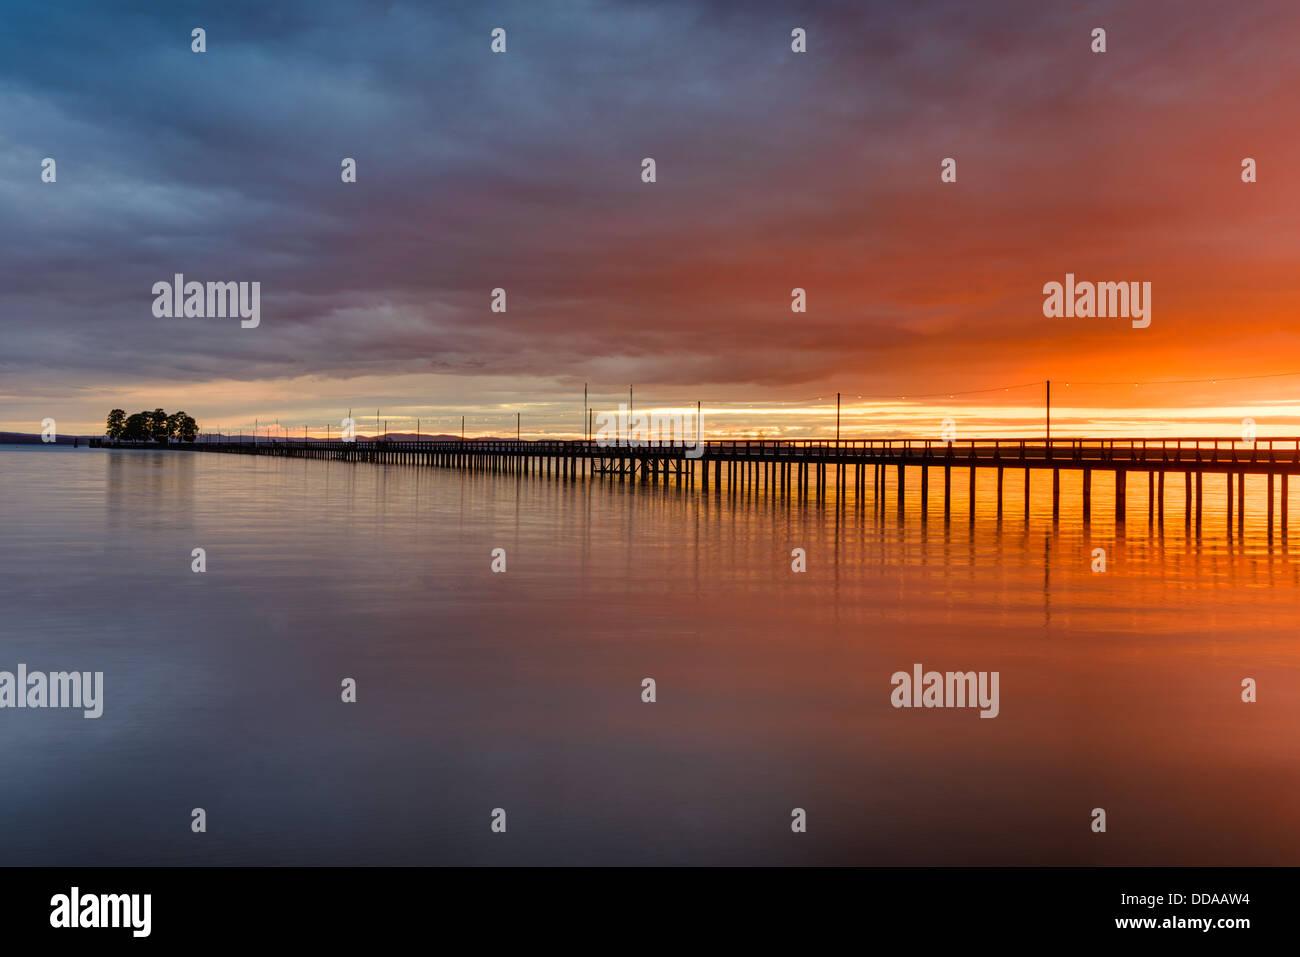 Pier on lake at sunset, Rättvik, Dalarna, Sweden - Stock Image